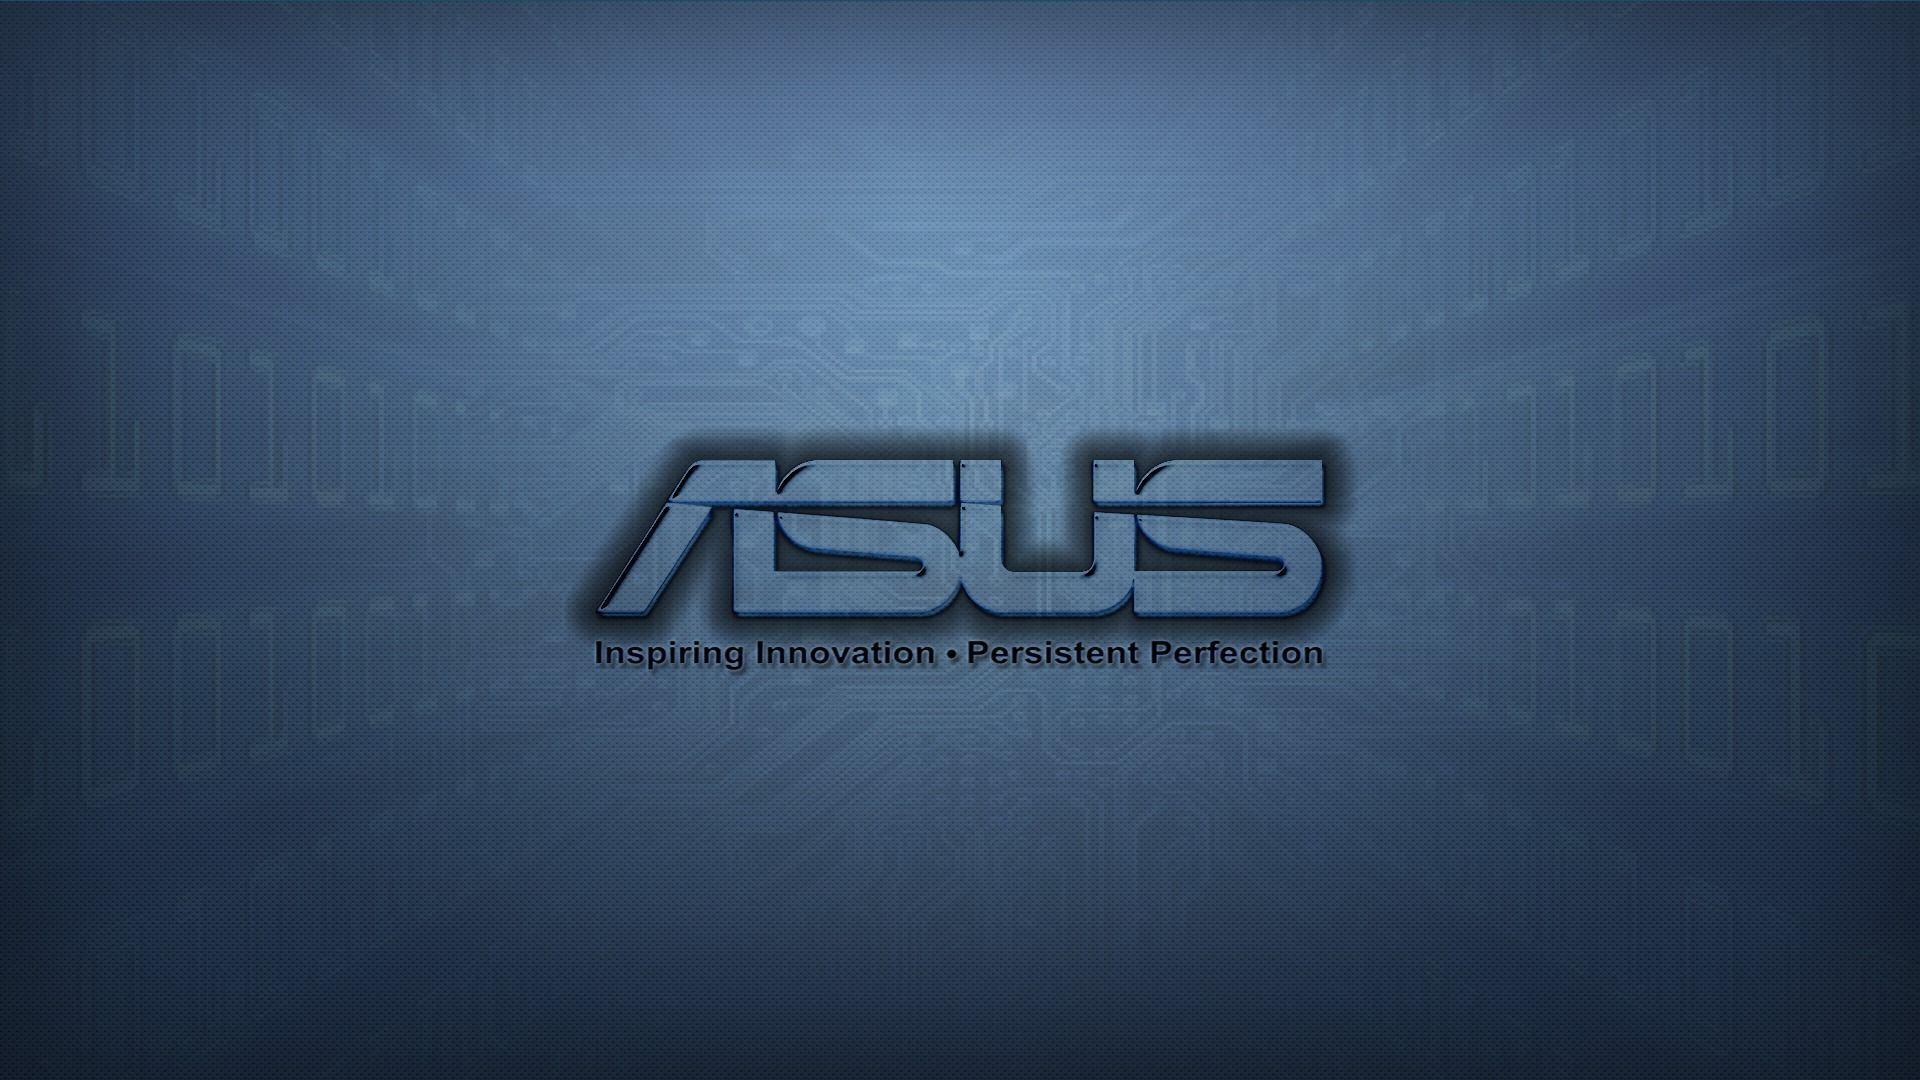 Asus Wallpapers Widescreen: Asus Wallpapers HD